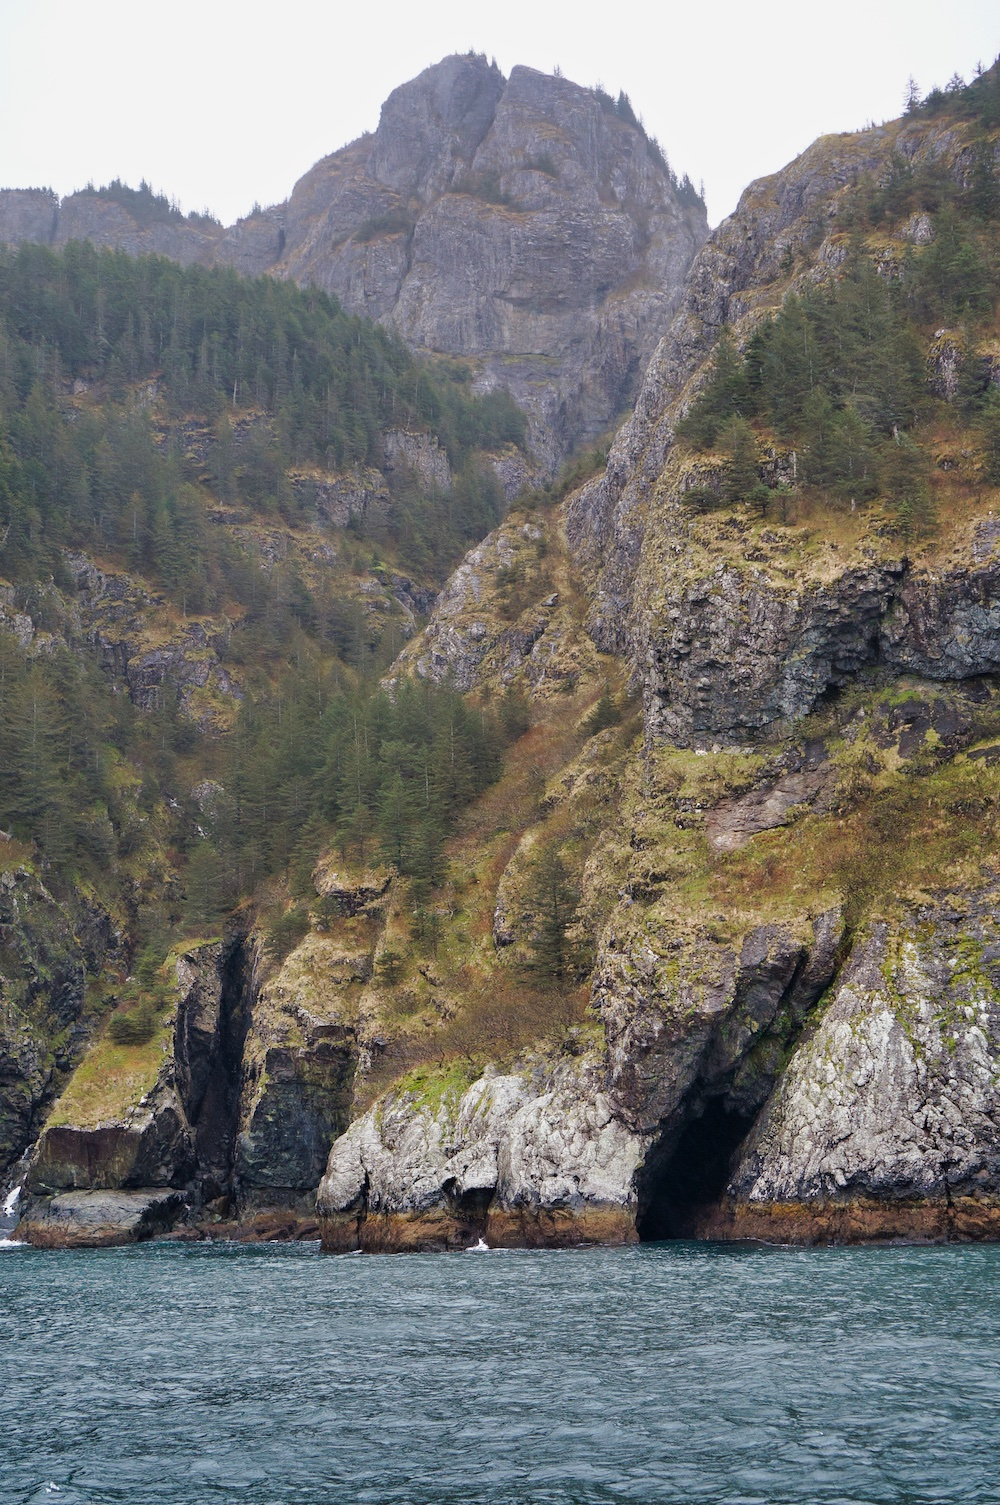 Cliffs in Kenai Fjords National Park